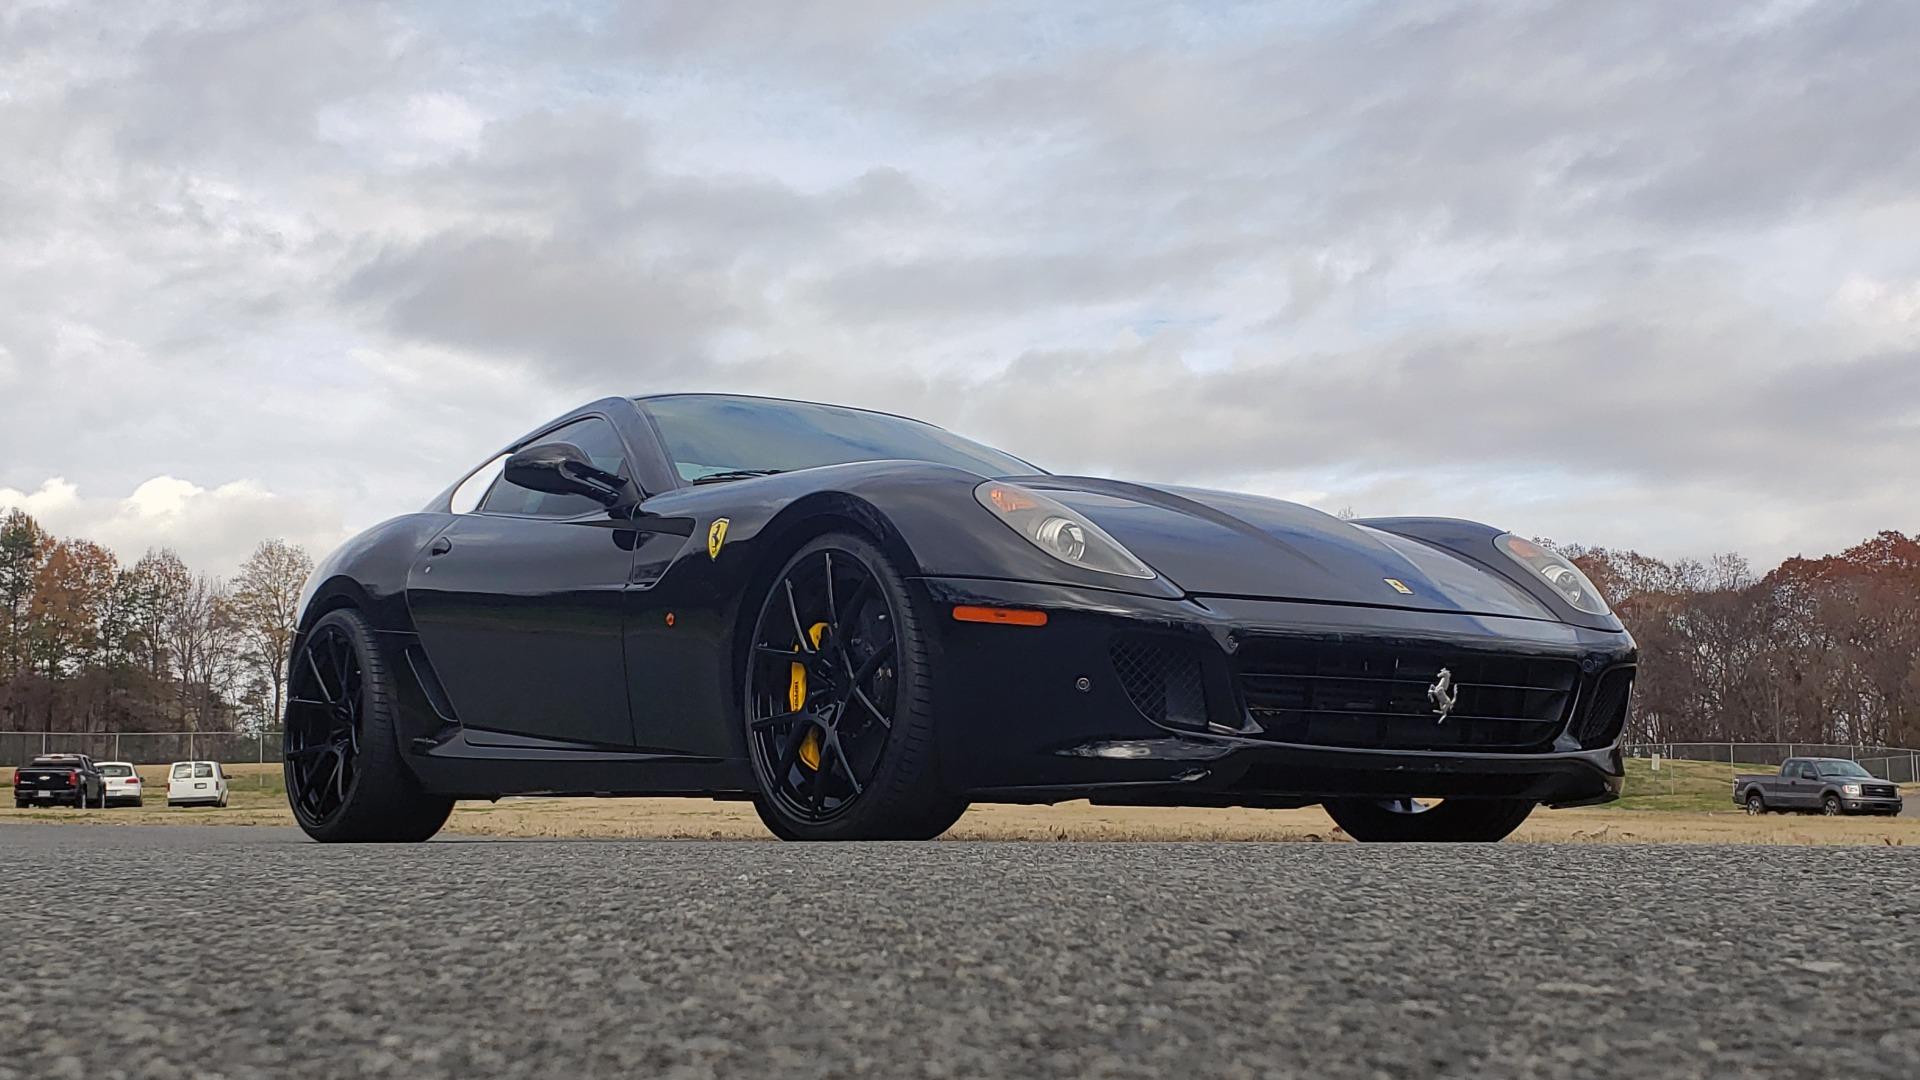 Used 2007 Ferrari 599 GTB FIORANO HGTE / V12 / F1 TRANS / NAV / BOSE / CUSTOM WHEELS for sale $109,999 at Formula Imports in Charlotte NC 28227 12